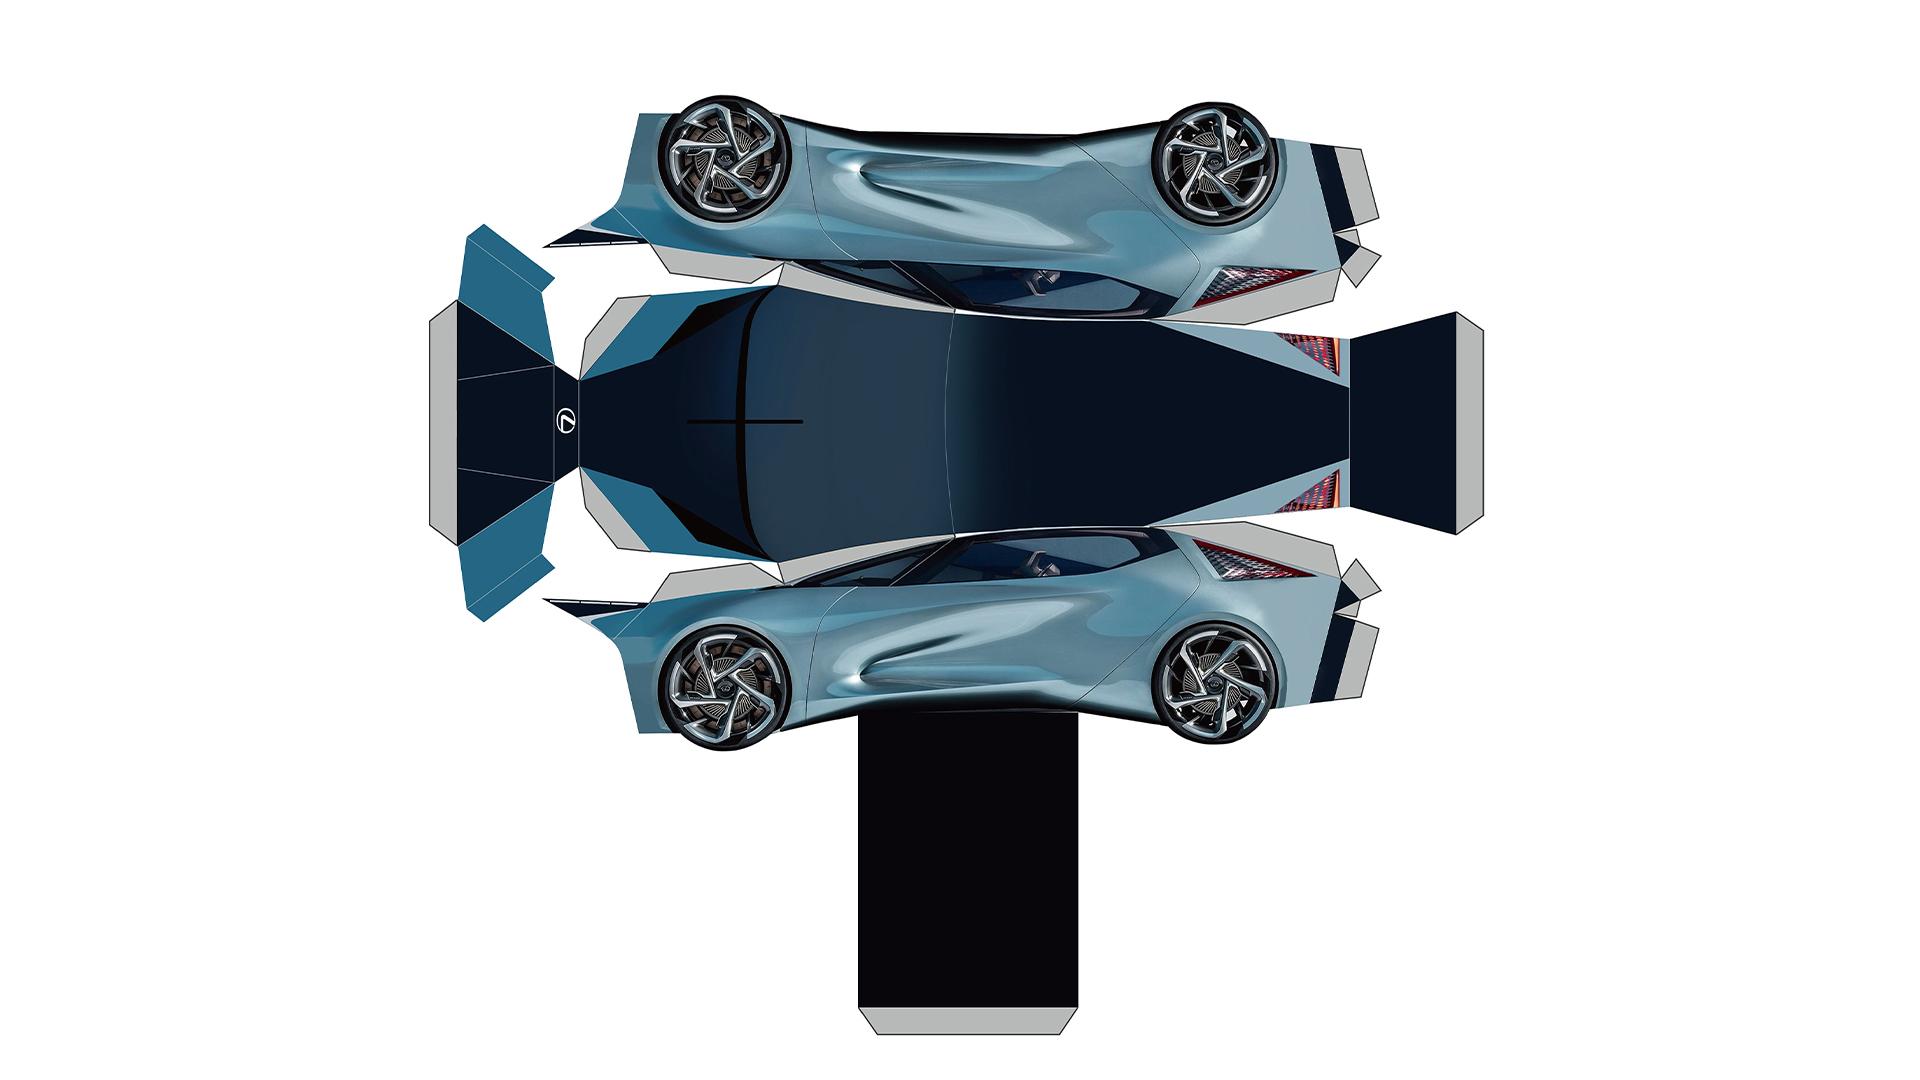 konsept otomobil lexus lf 30 evinizde